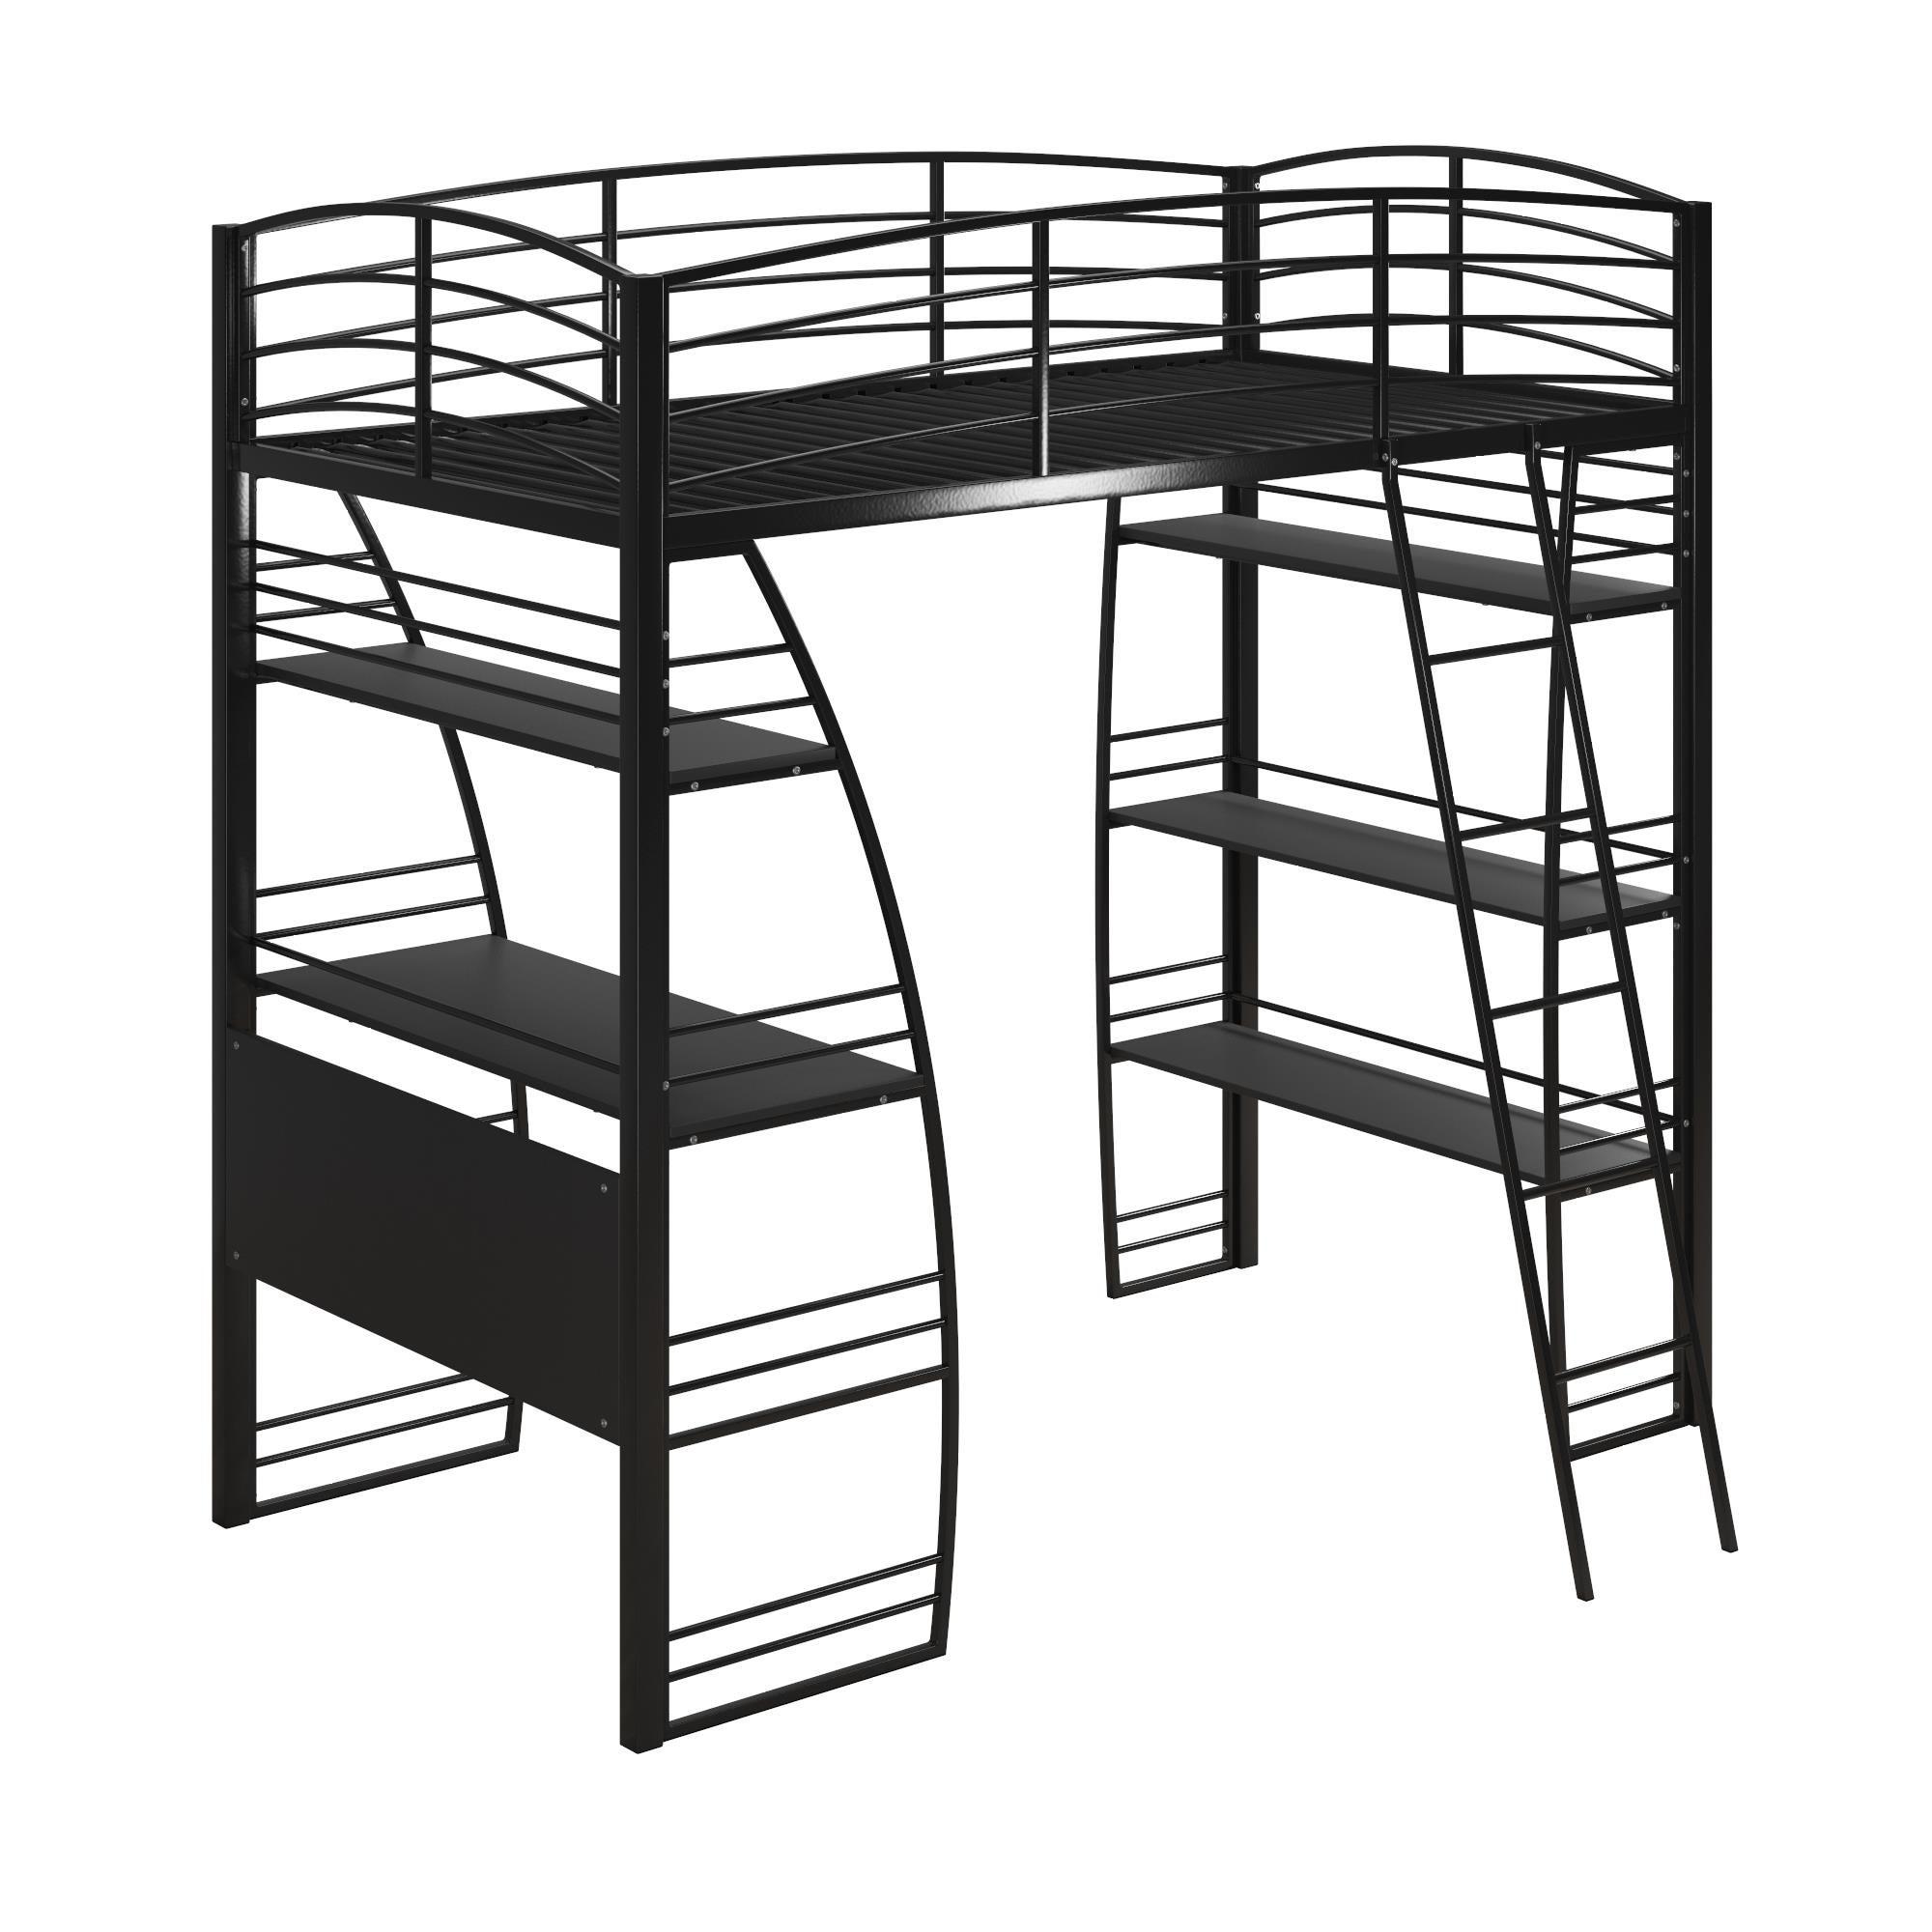 2000x2000 Shop Avenue Greene Sansa Twin Loft Bed With Integrated Desk